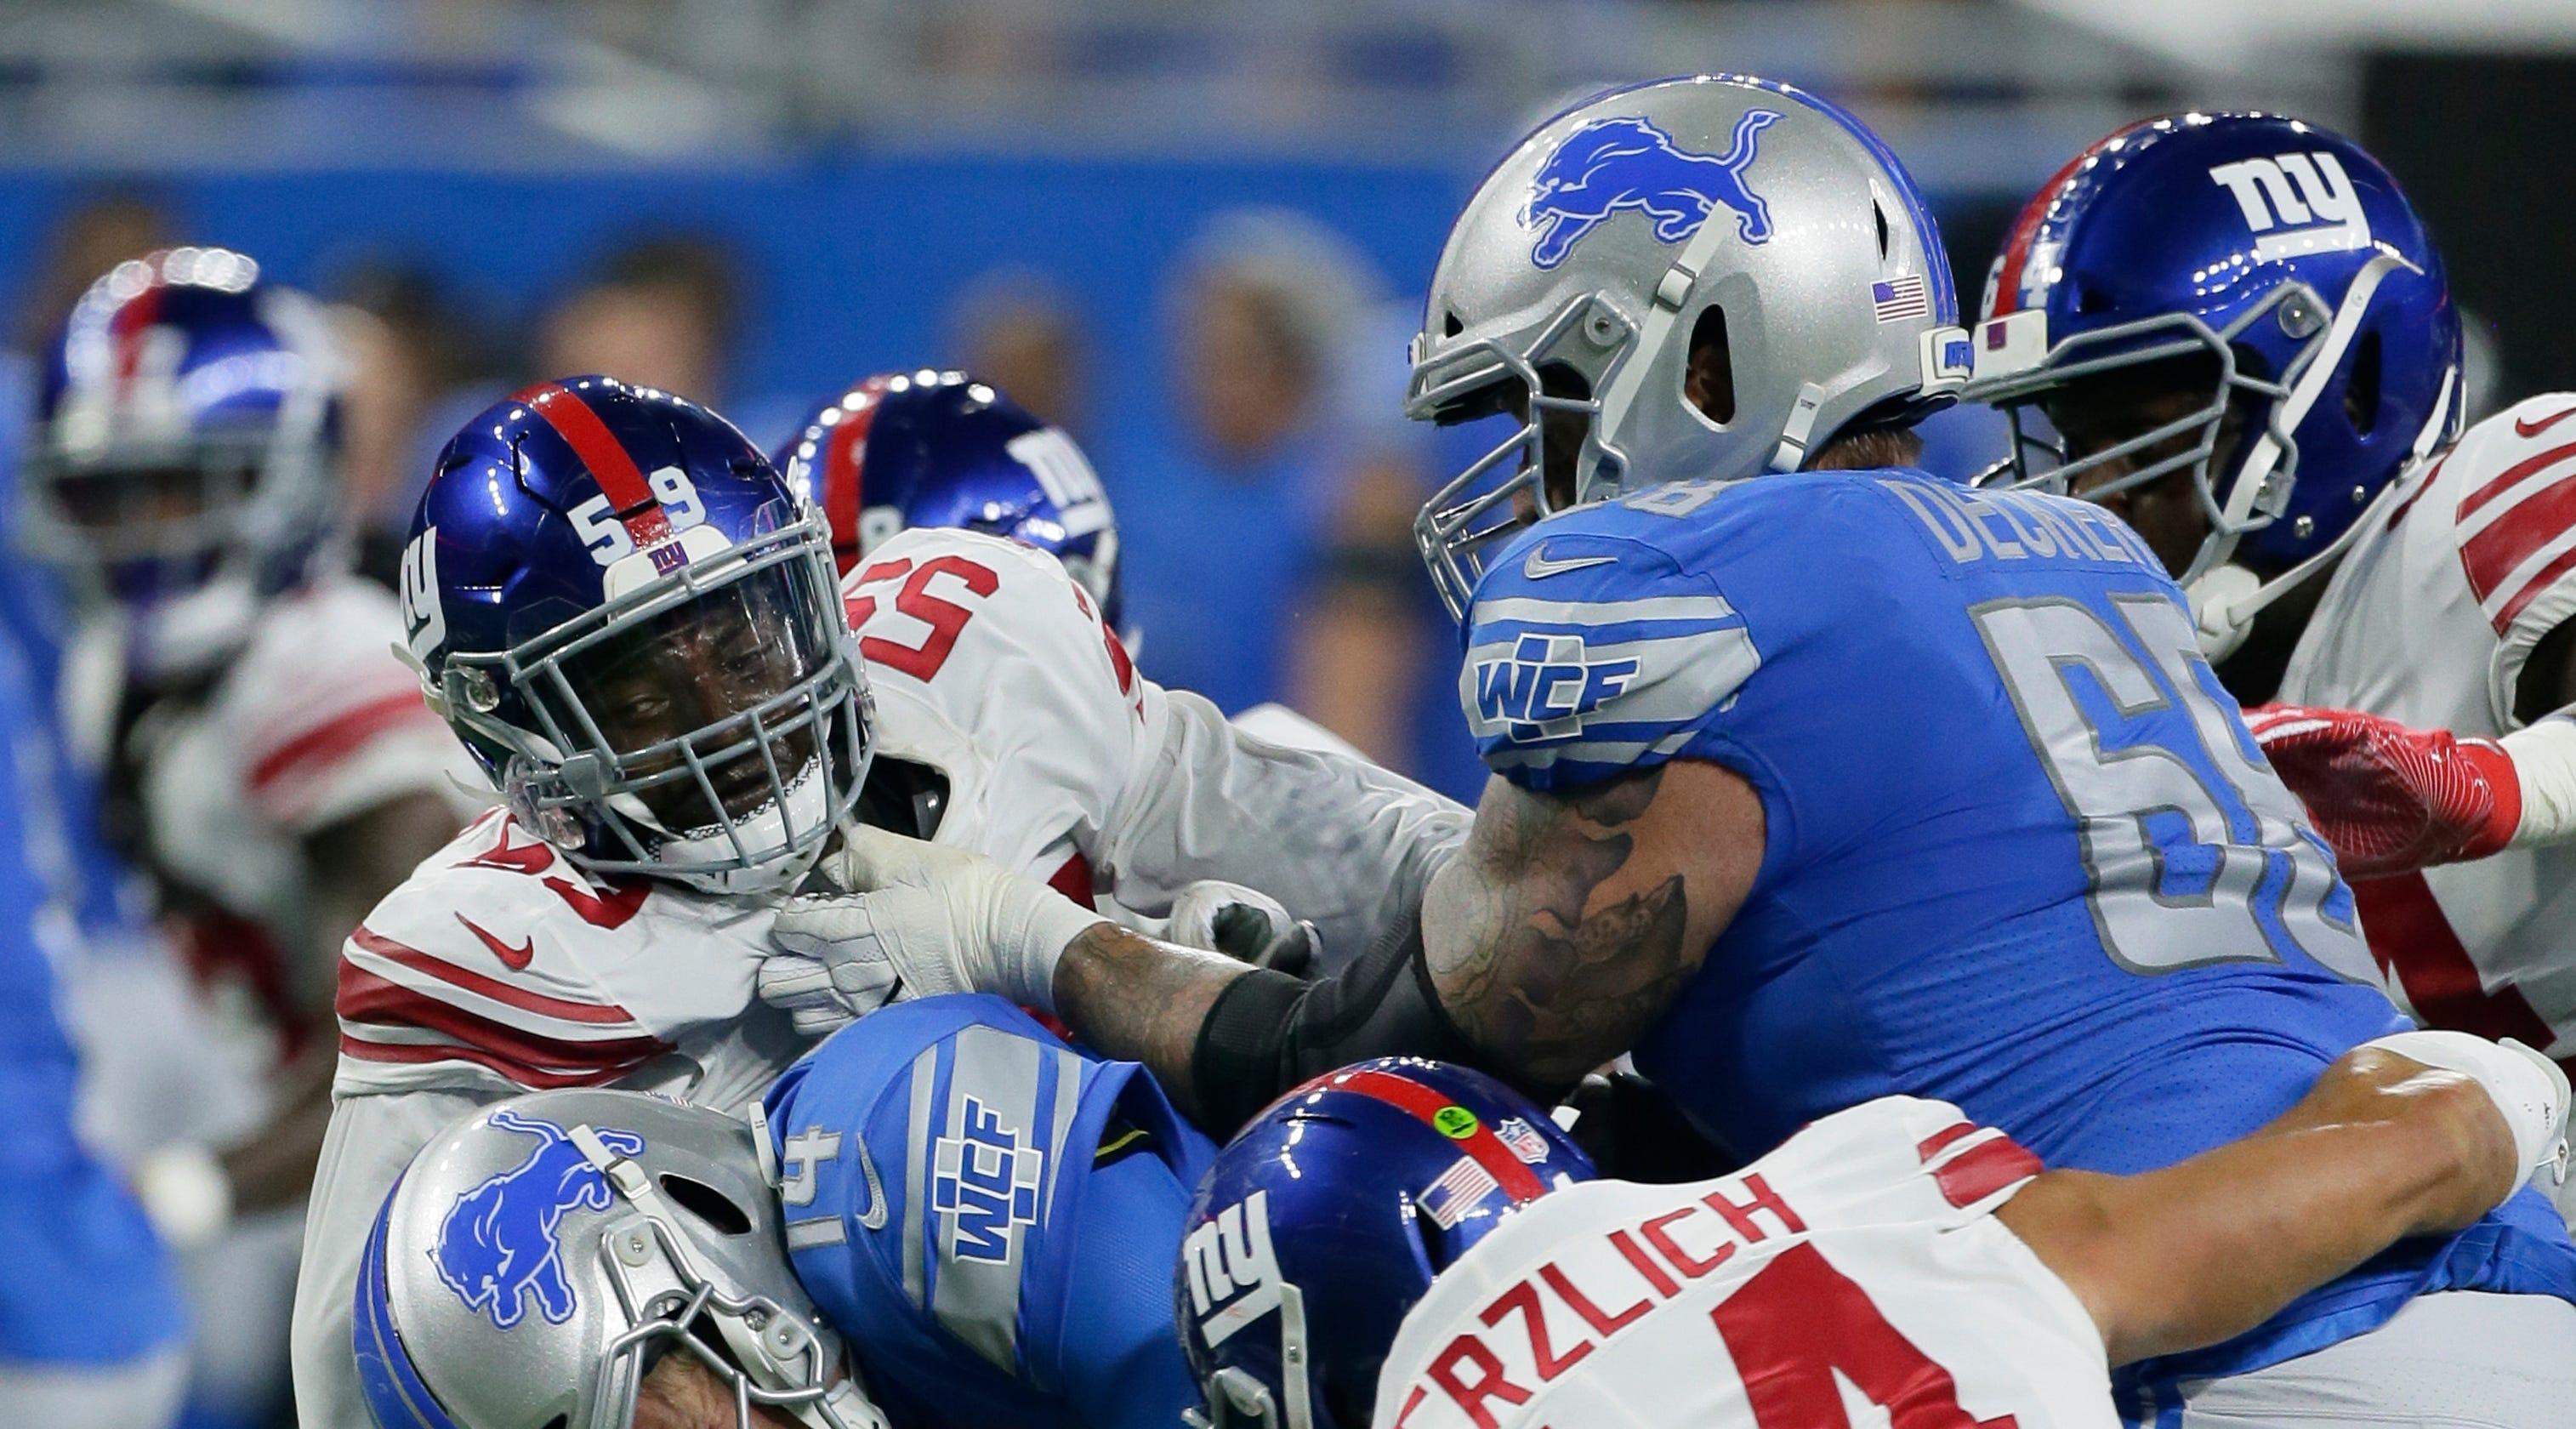 NFL Rulebook | NFL Football Operations